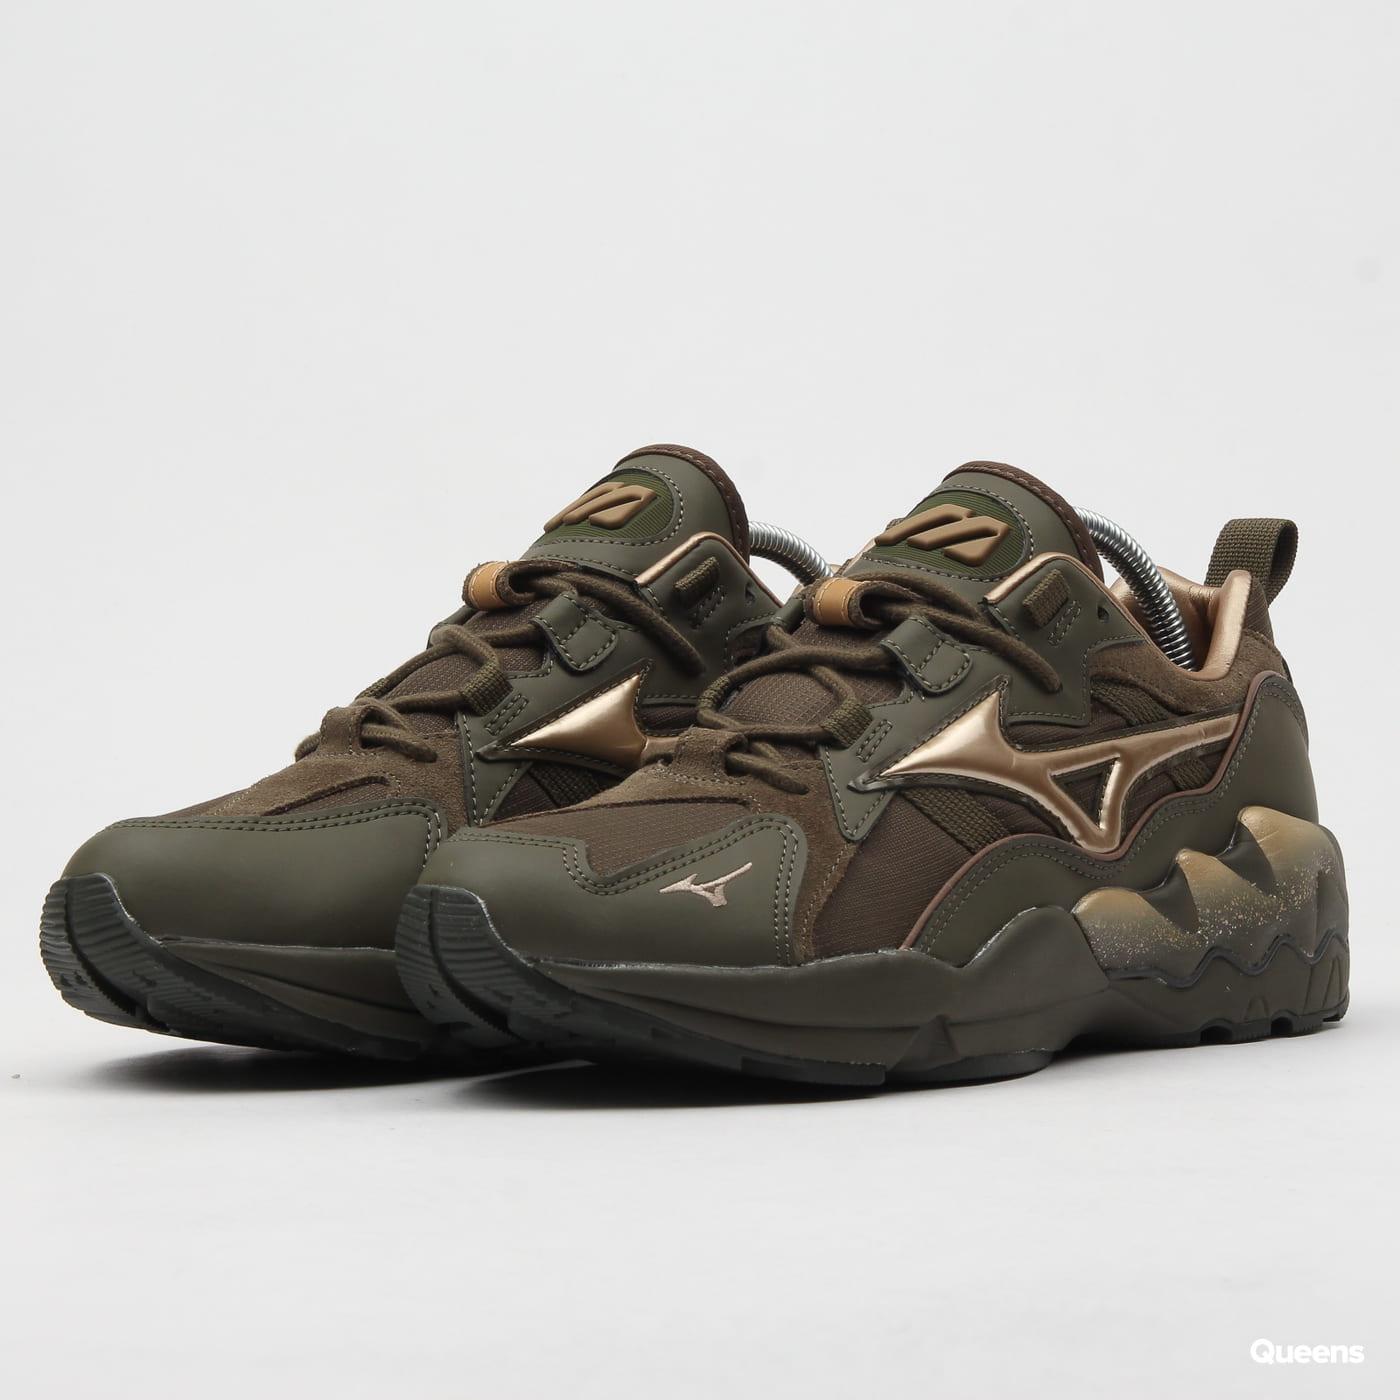 mizuno shoes size 39 for ladies night